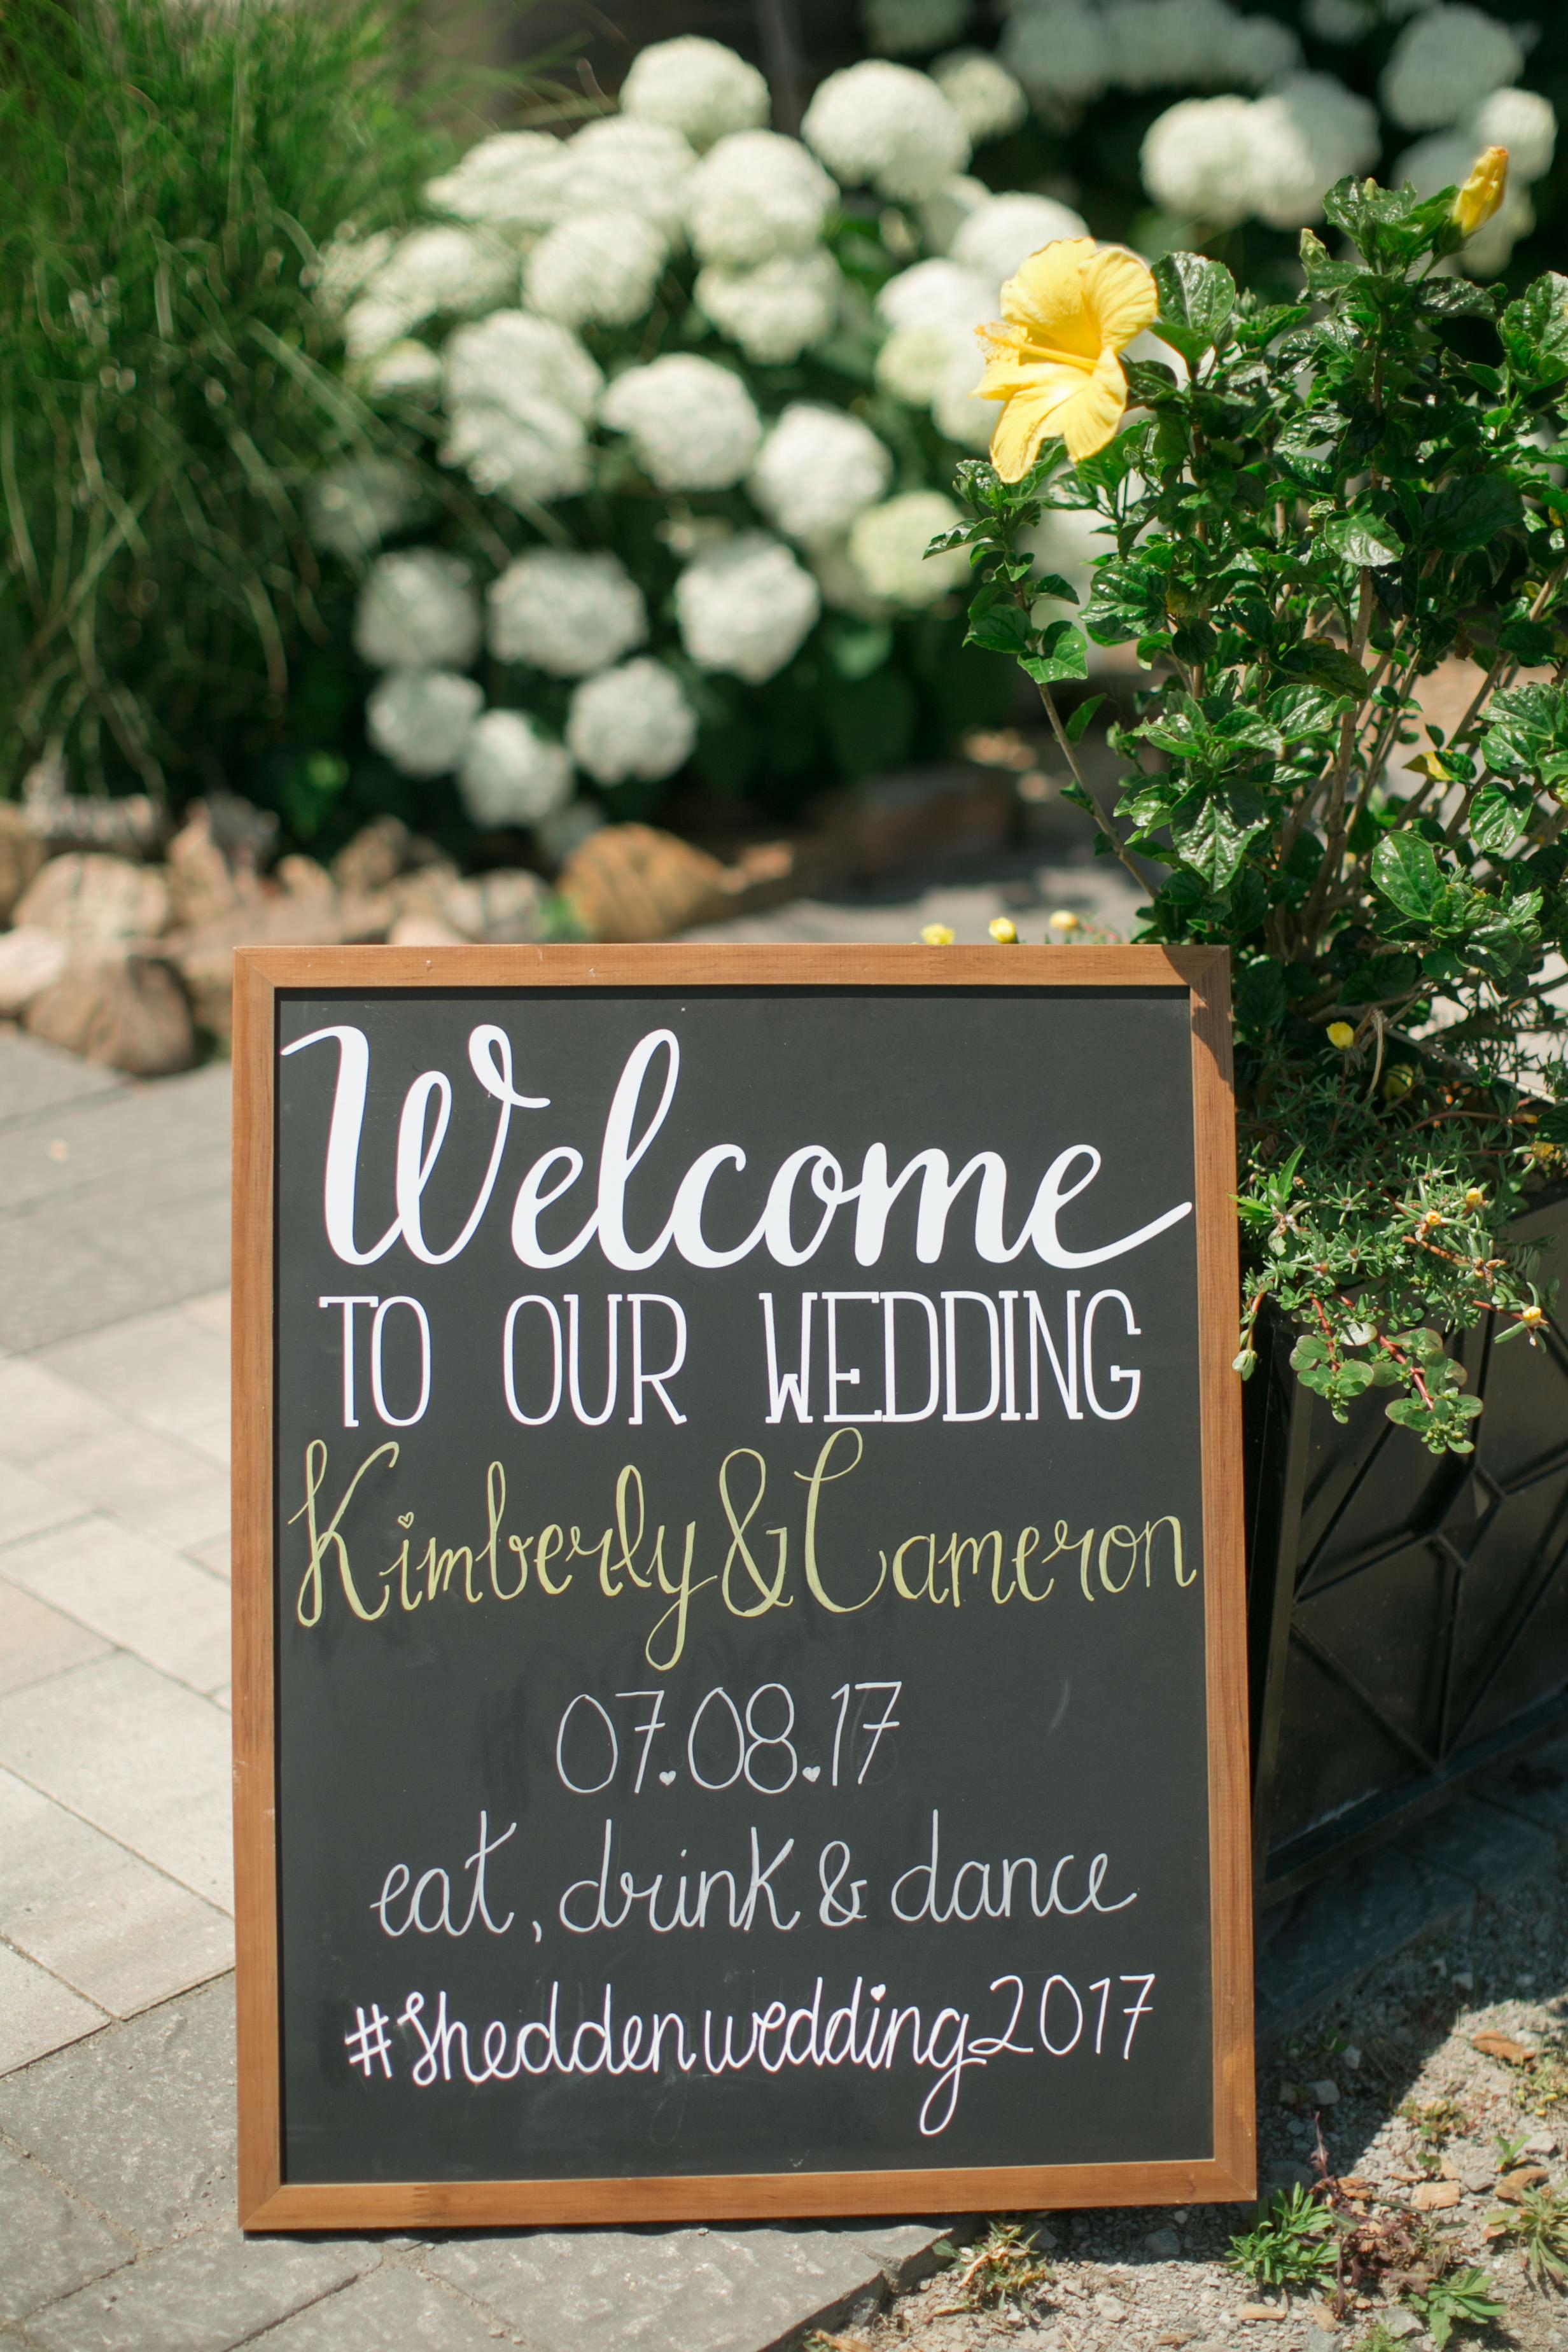 Kimberley + Cameron - Daniel Ricci Weddings - High Res. Finals-85.jpg